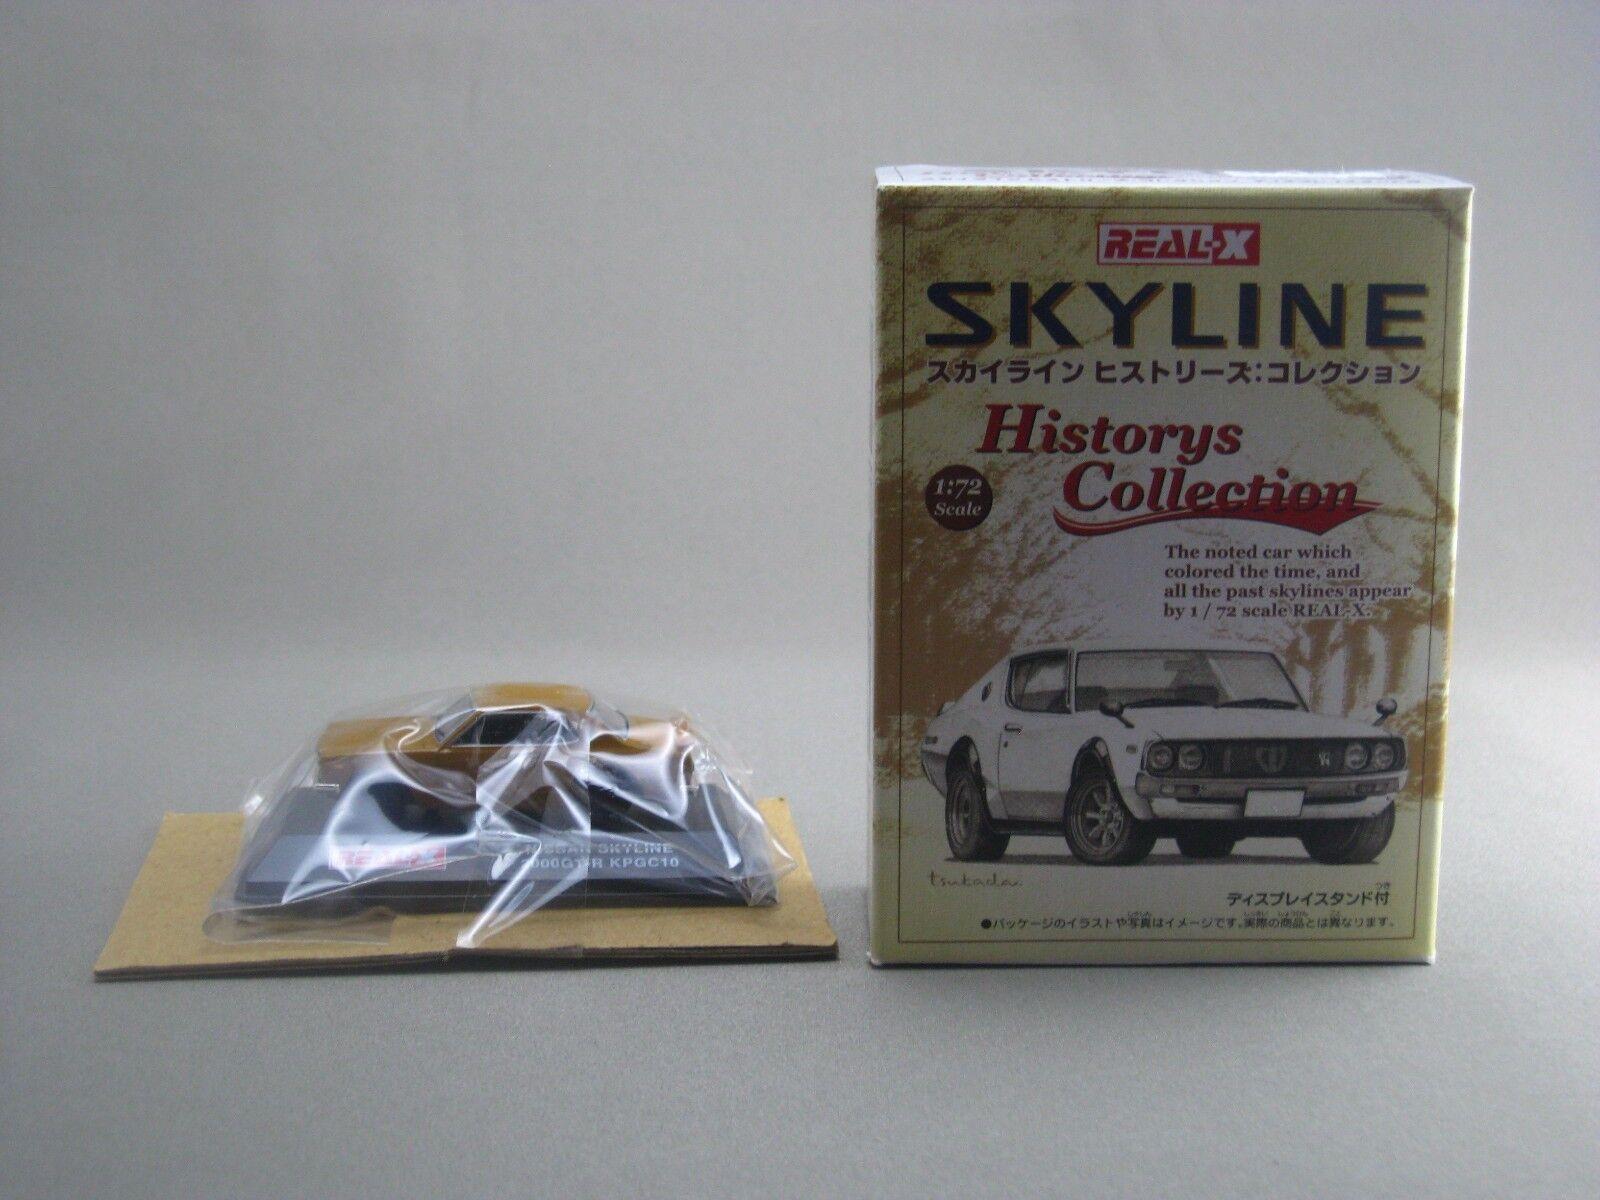 NISSAN SKYLINE 2000GT - R KPGC10 brun 1 72 REAL X HISTORIER